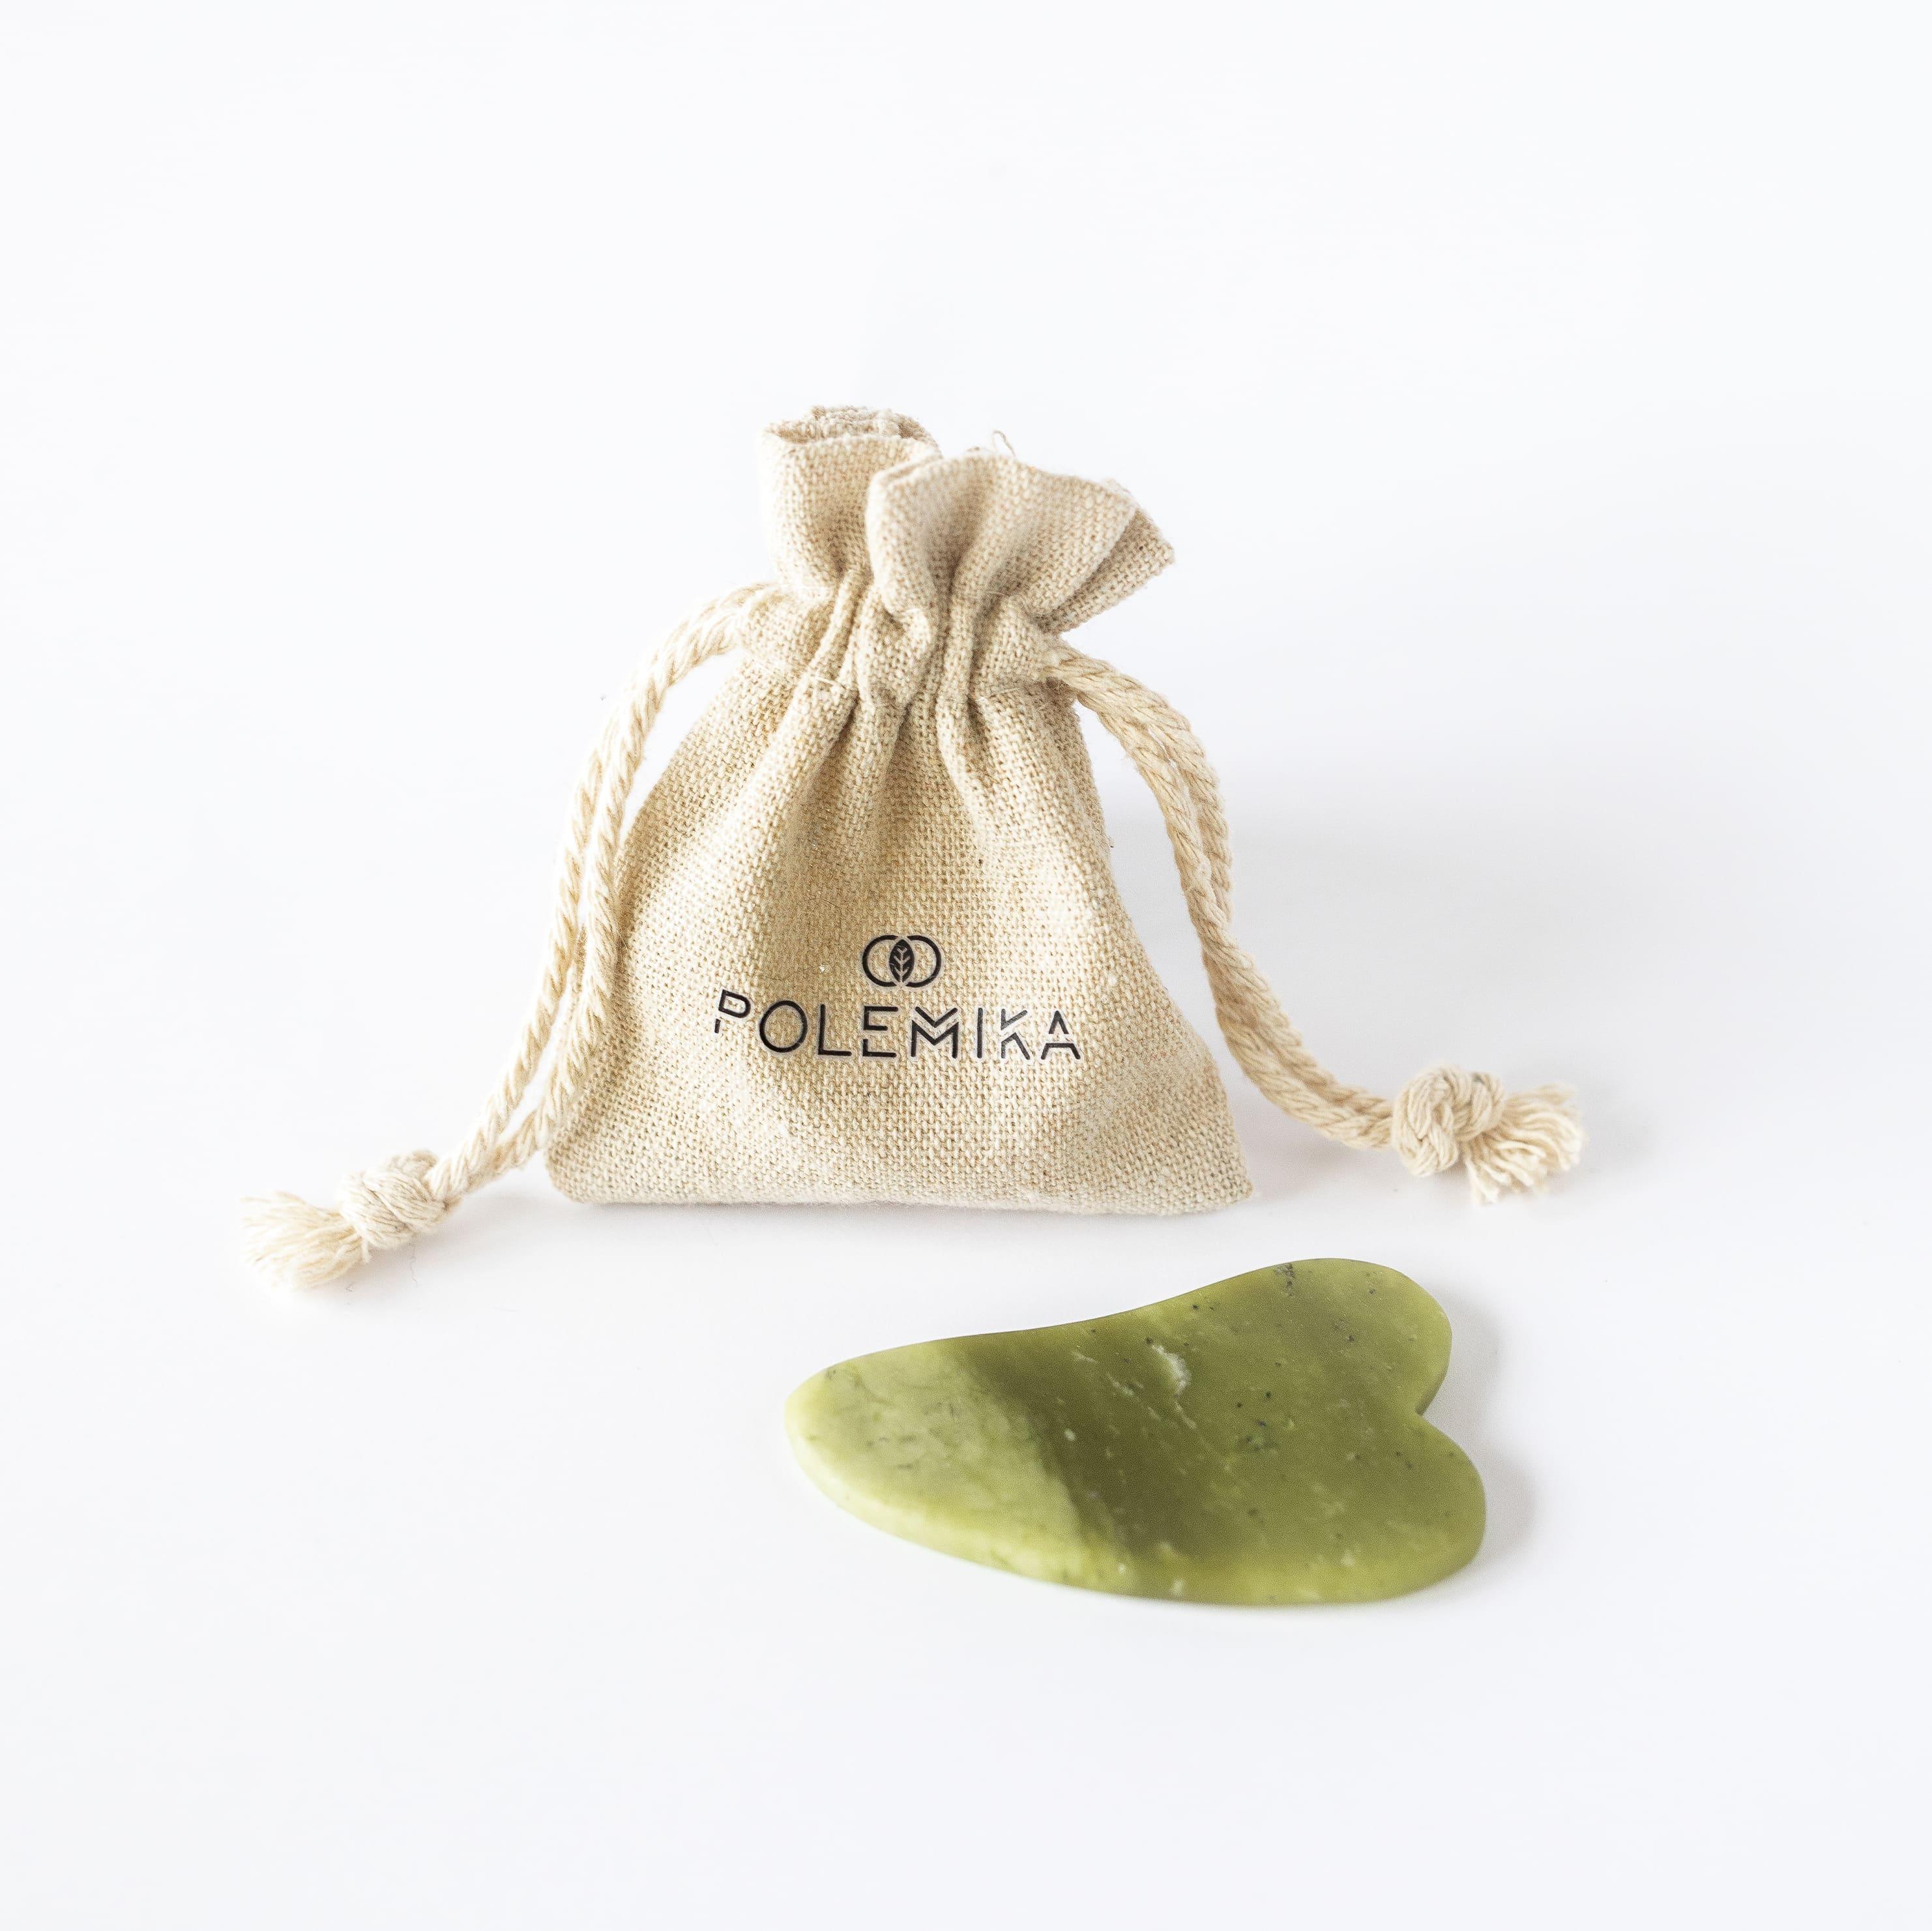 Płytka jadeitowa do masażu gua sha